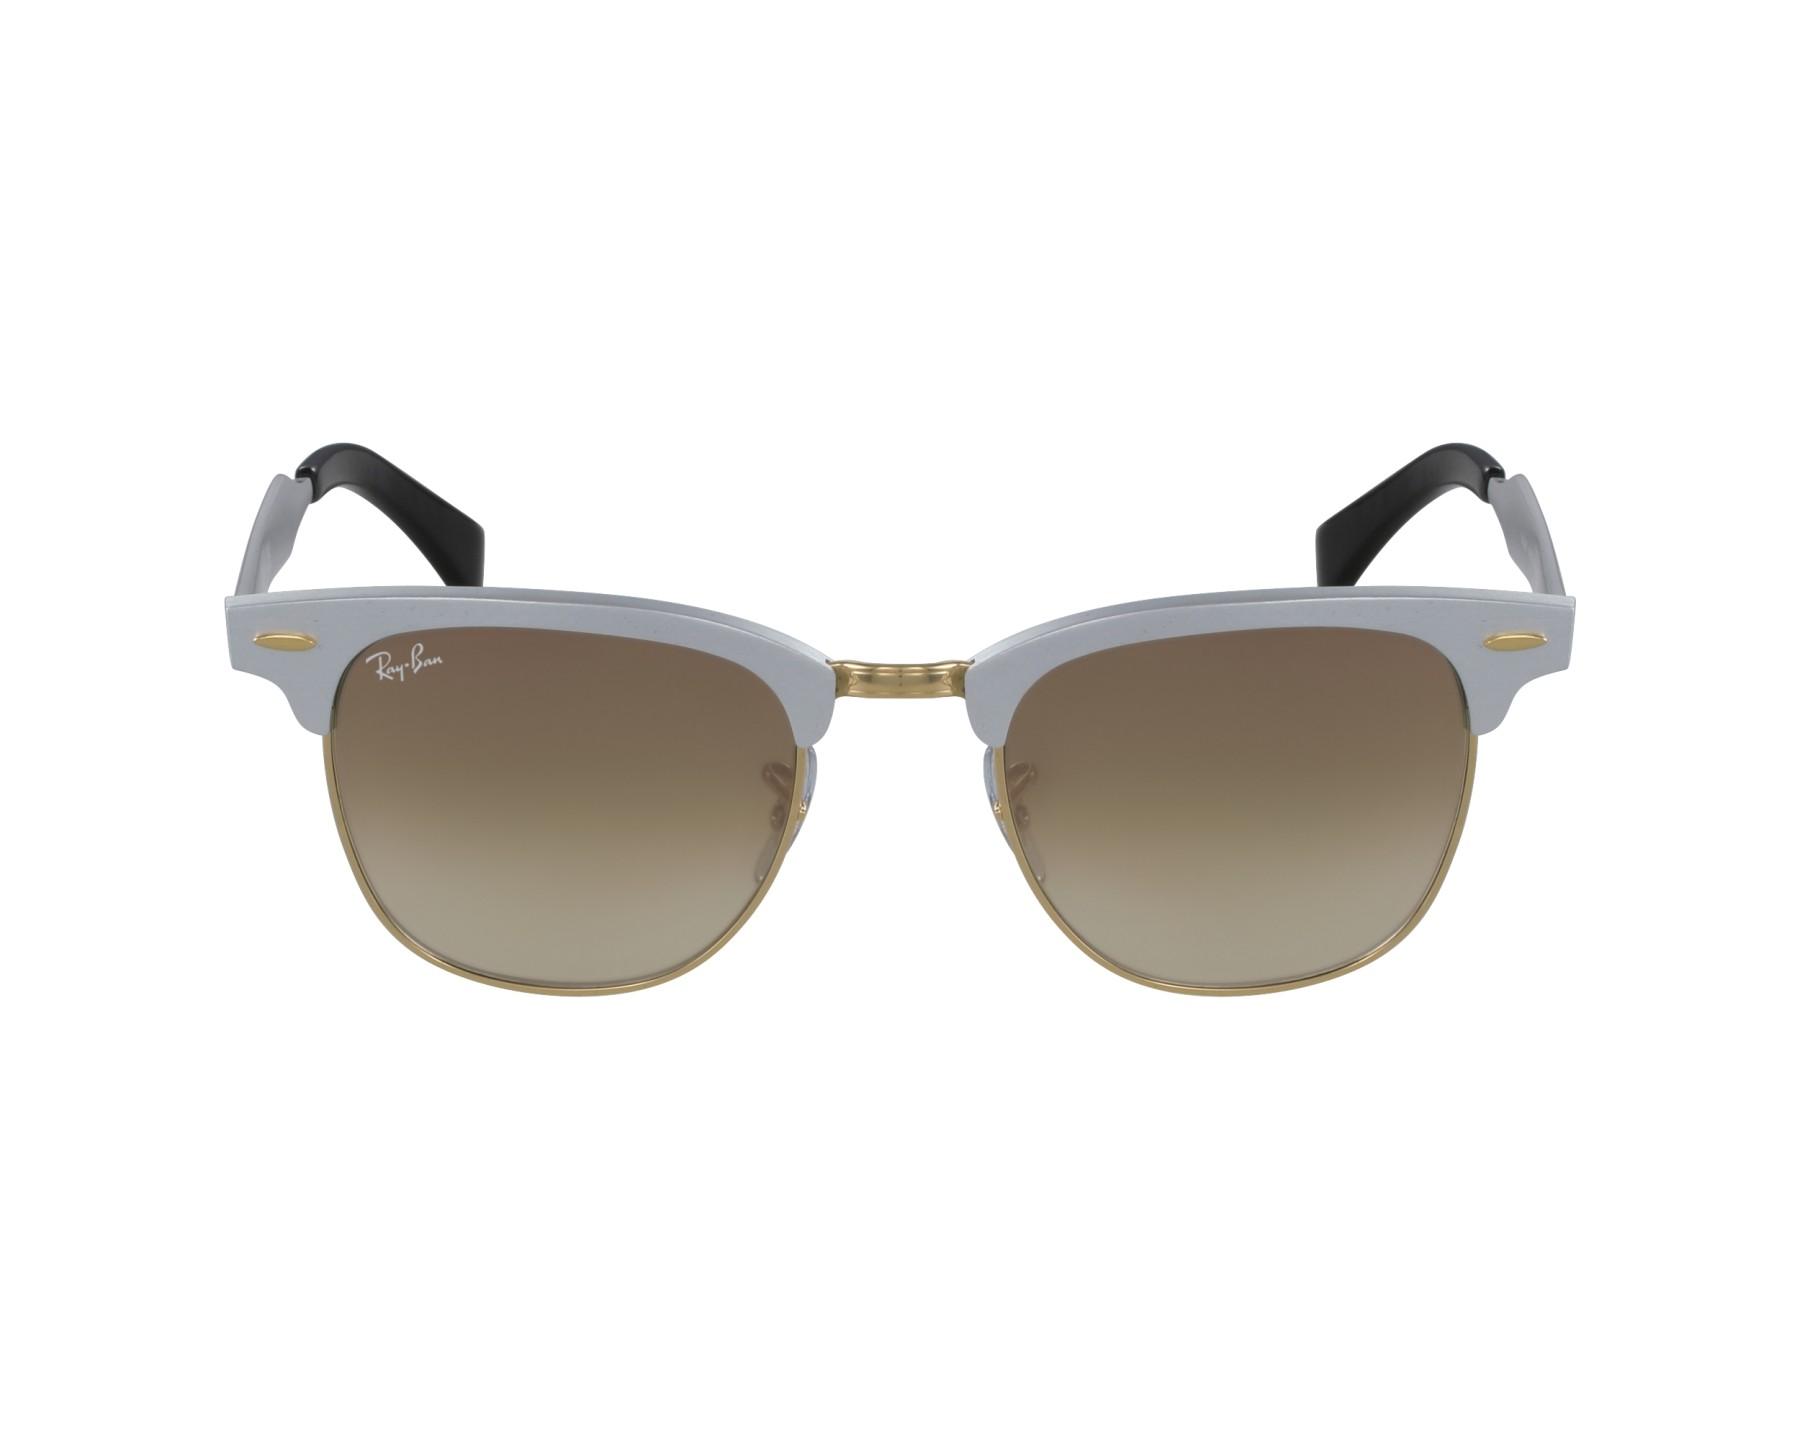 ae65a3c55c0bf ... discount code for sunglasses ray ban rb 3507 137 7o 49 21 silver gold  profile 10da3 ...